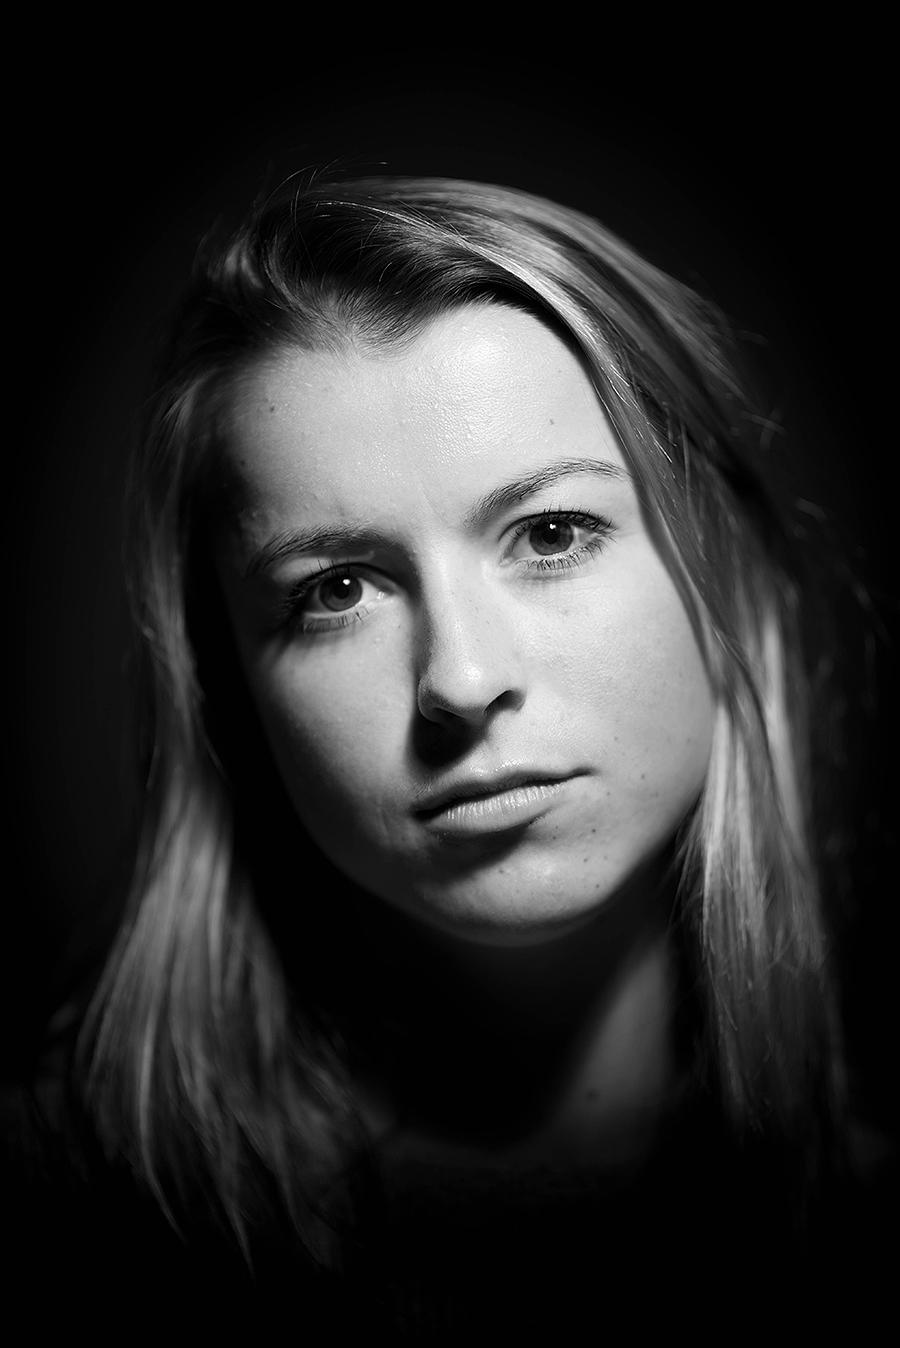 Megan_A1_Despair_photography_model_photo_emotion_portrait_headshot_kaleb_germinaro.jpg